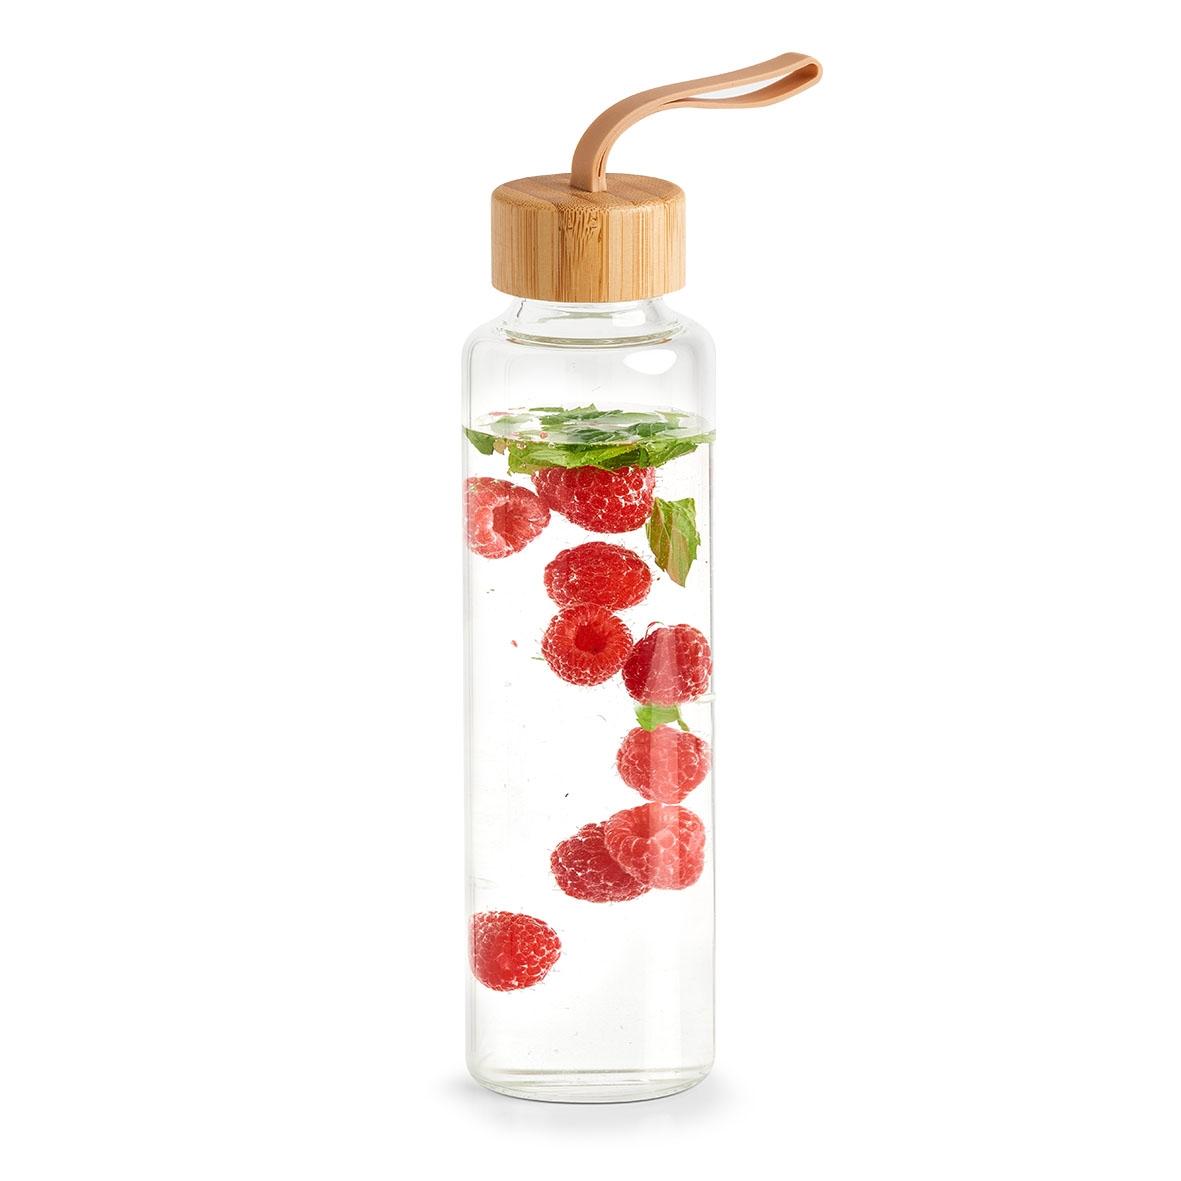 Sticla pentru apa Bamboo Transparent, 560 ml, Ø6,5xH24 cm poza